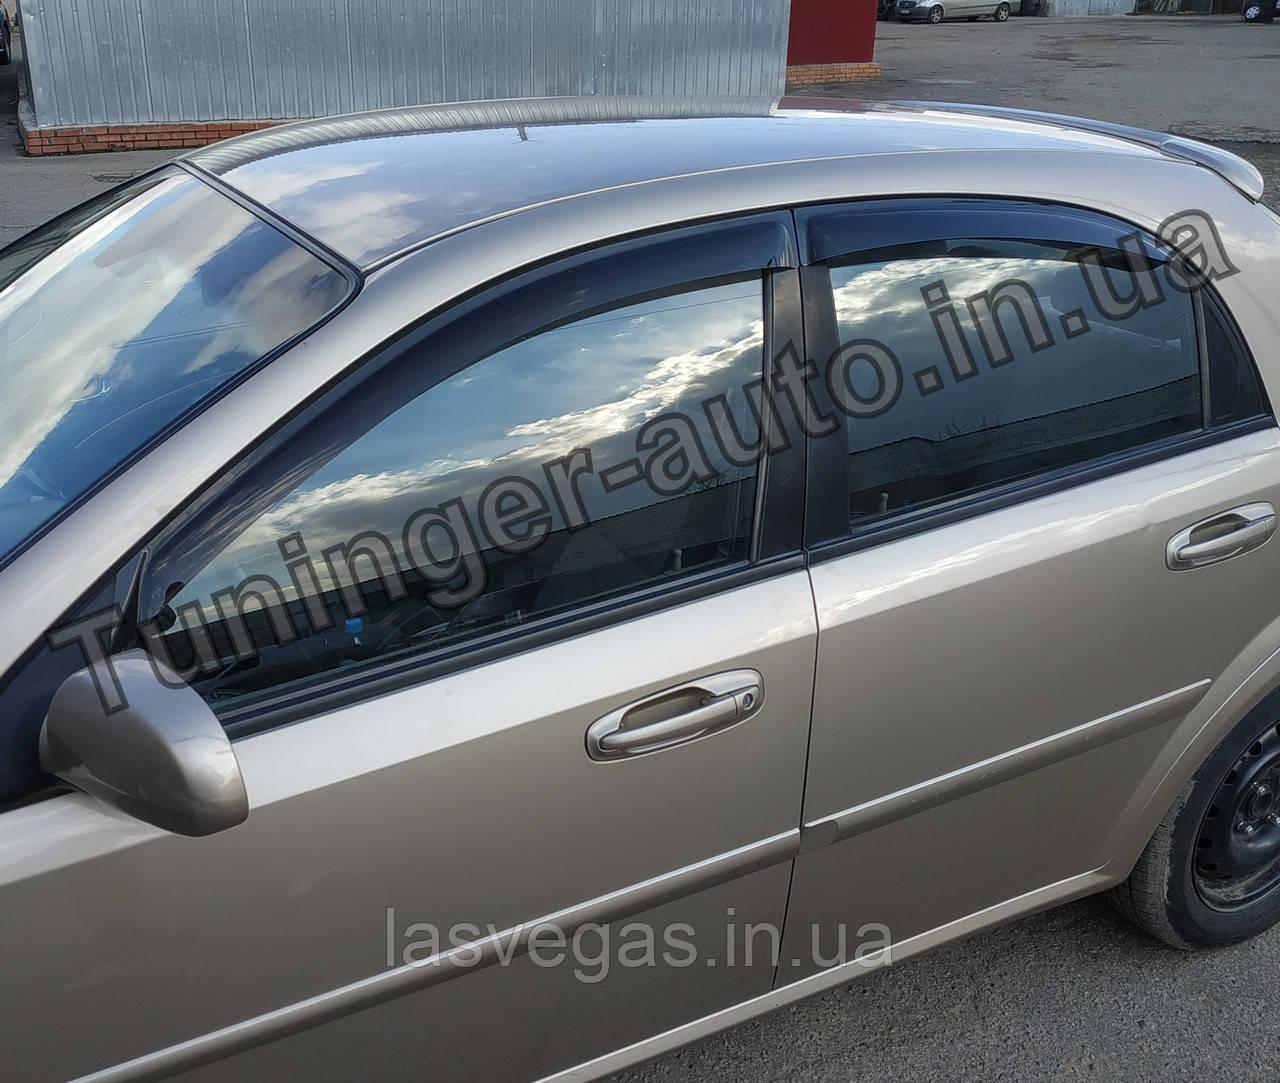 Вітровики, дефлектори вікон Chevrolet Lacetti Hatchback/Лачетті хетчбек 2004-2012(ANV)